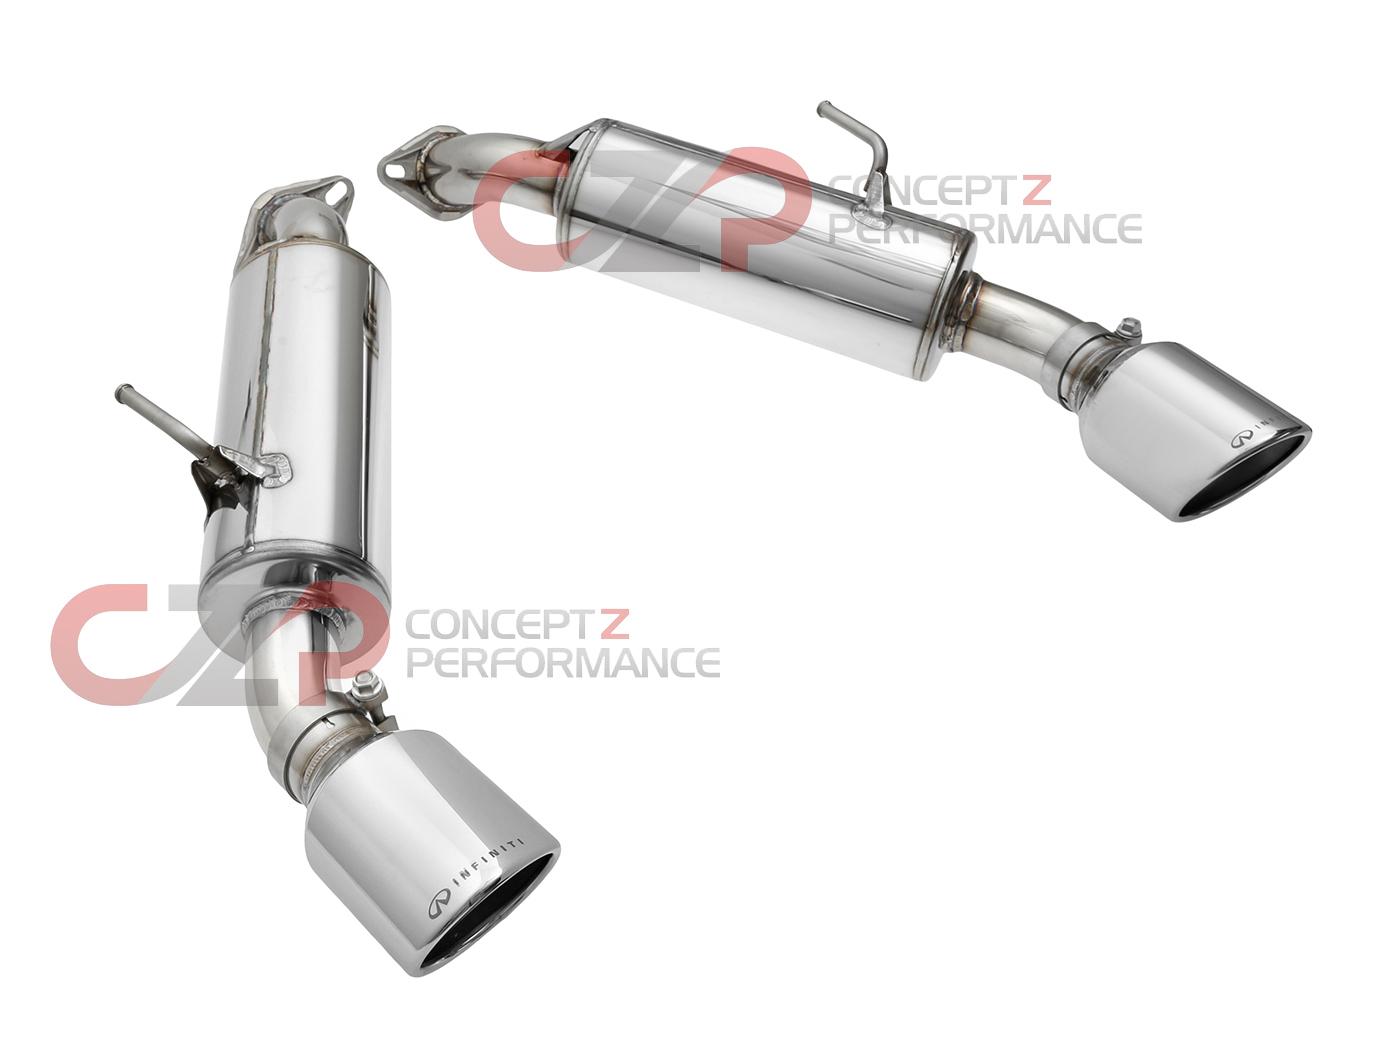 nissan infiniti infiniti sport exhaust w mufflers axle back exhaust system infiniti q50 14 15 v37 b0100 q50sm concept z performance